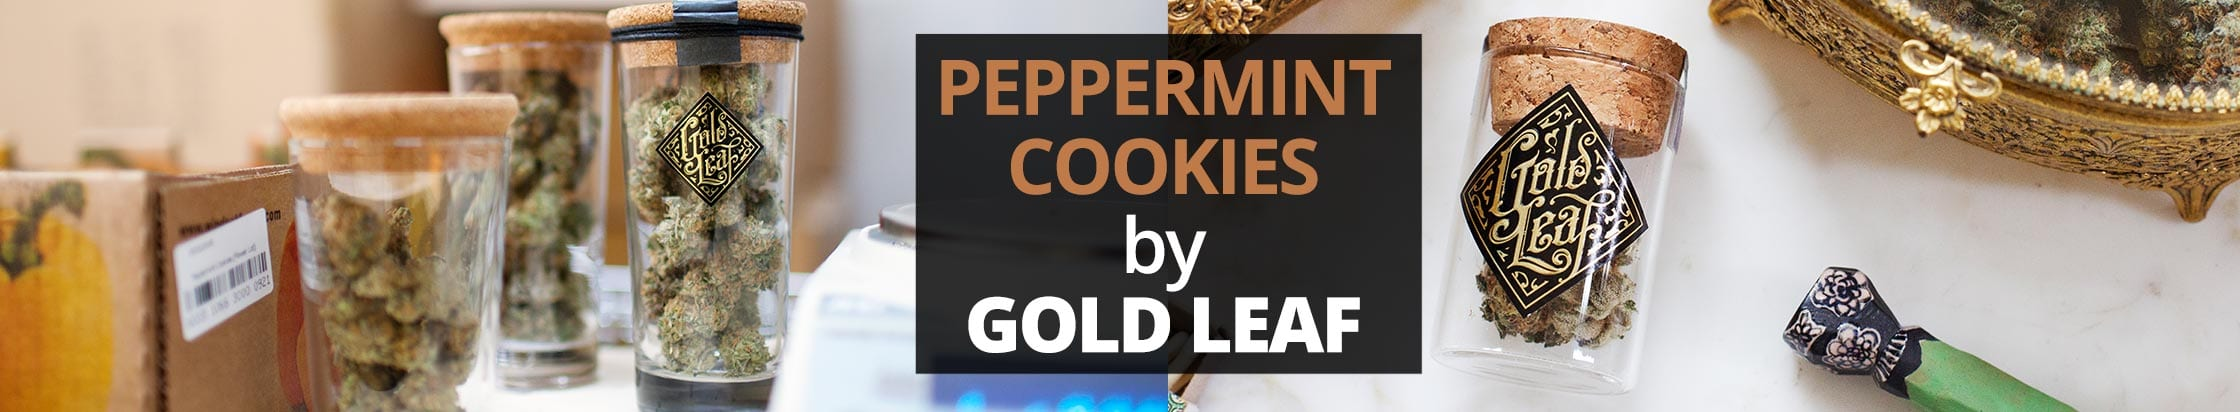 gold-leaf-pepper-mint-cookies-slice